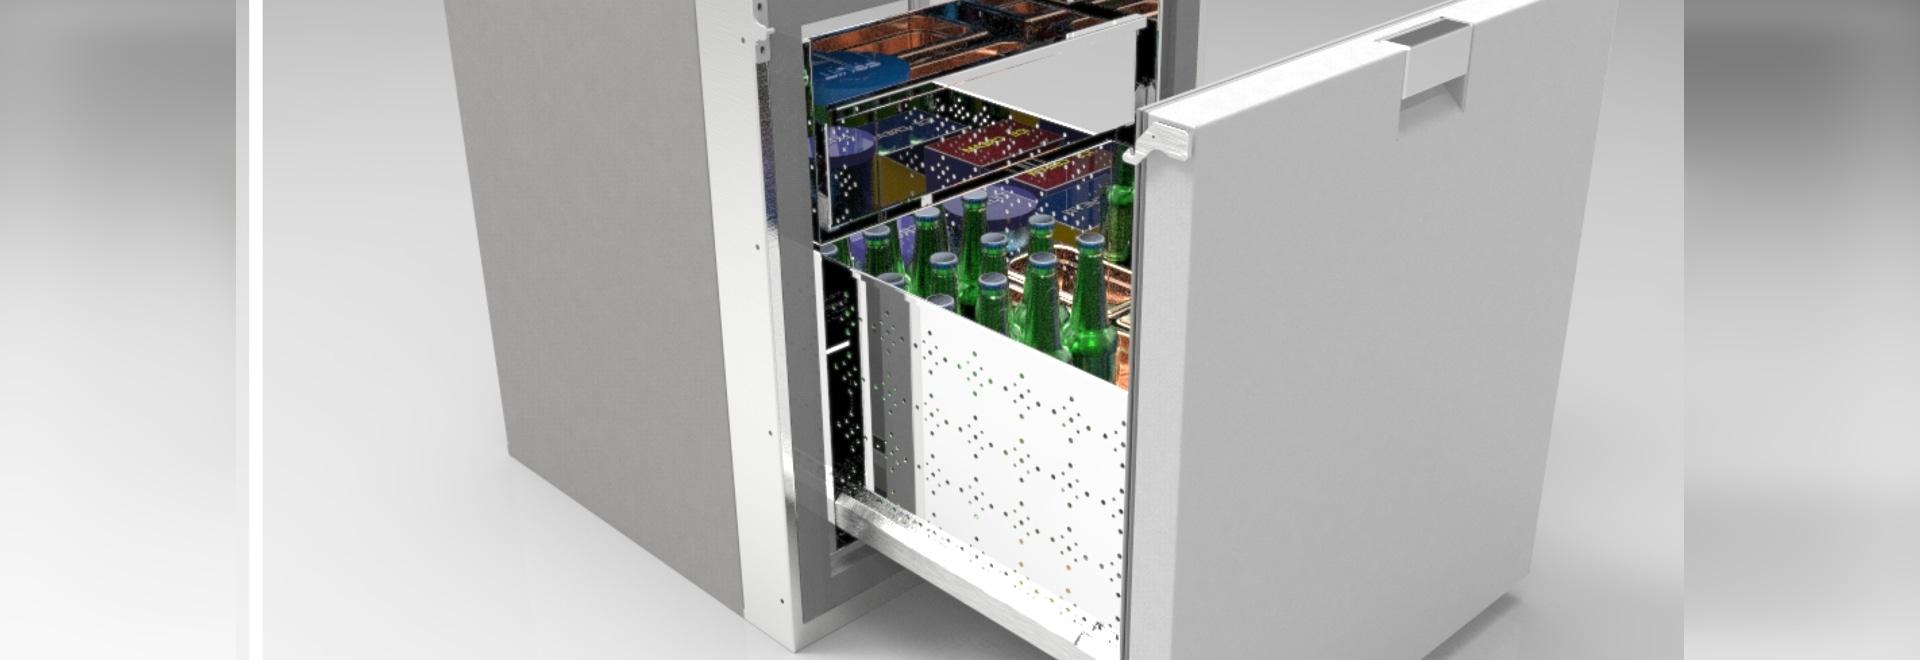 New drawer freezer: CC1